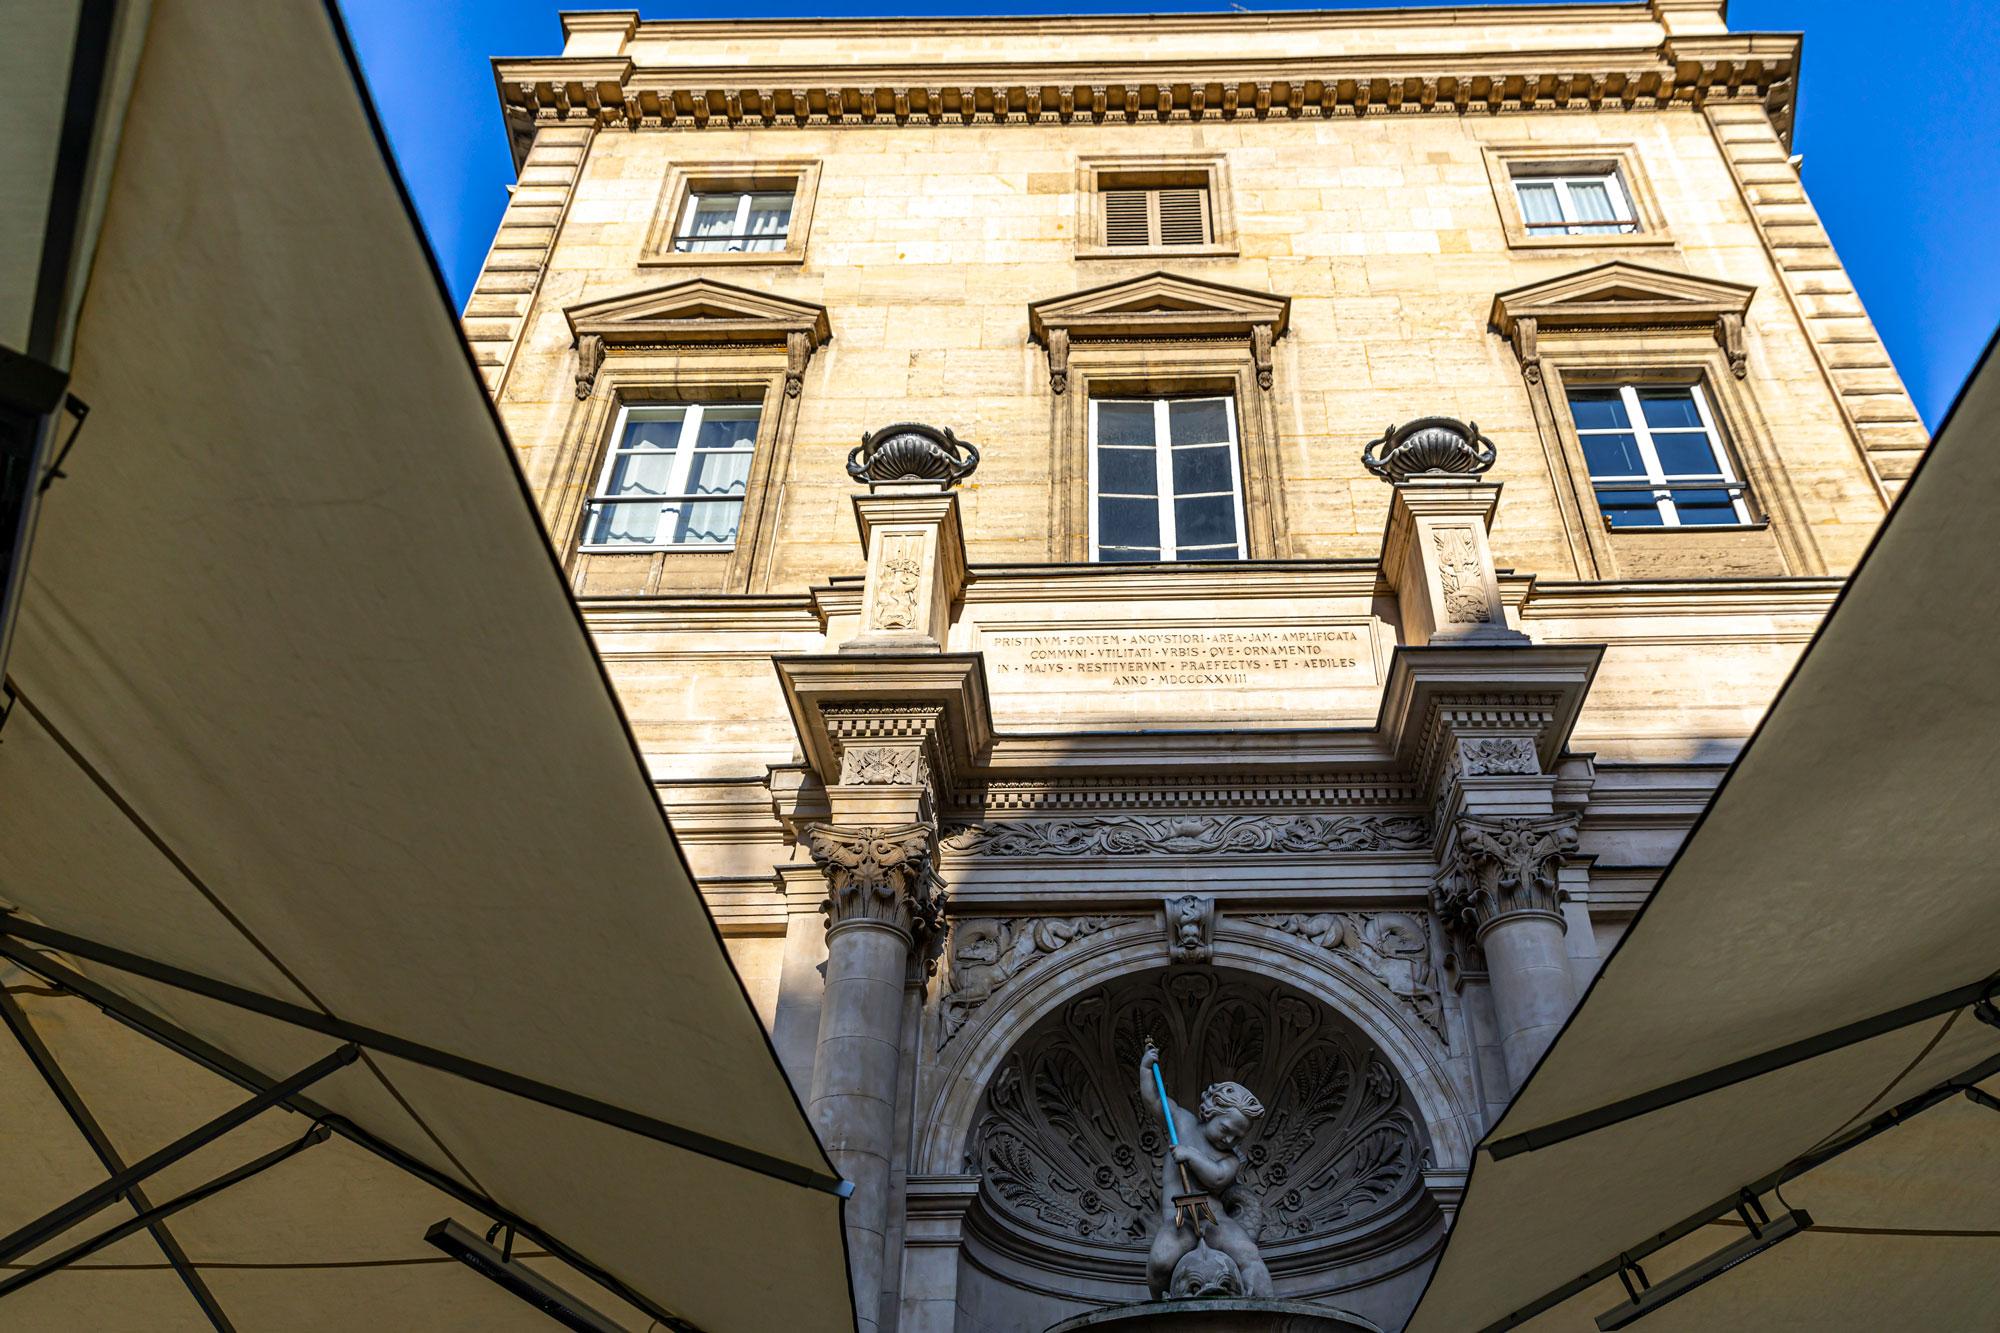 ville-anonyme-la-fontaine-gaillon-facade-hotel-particulier